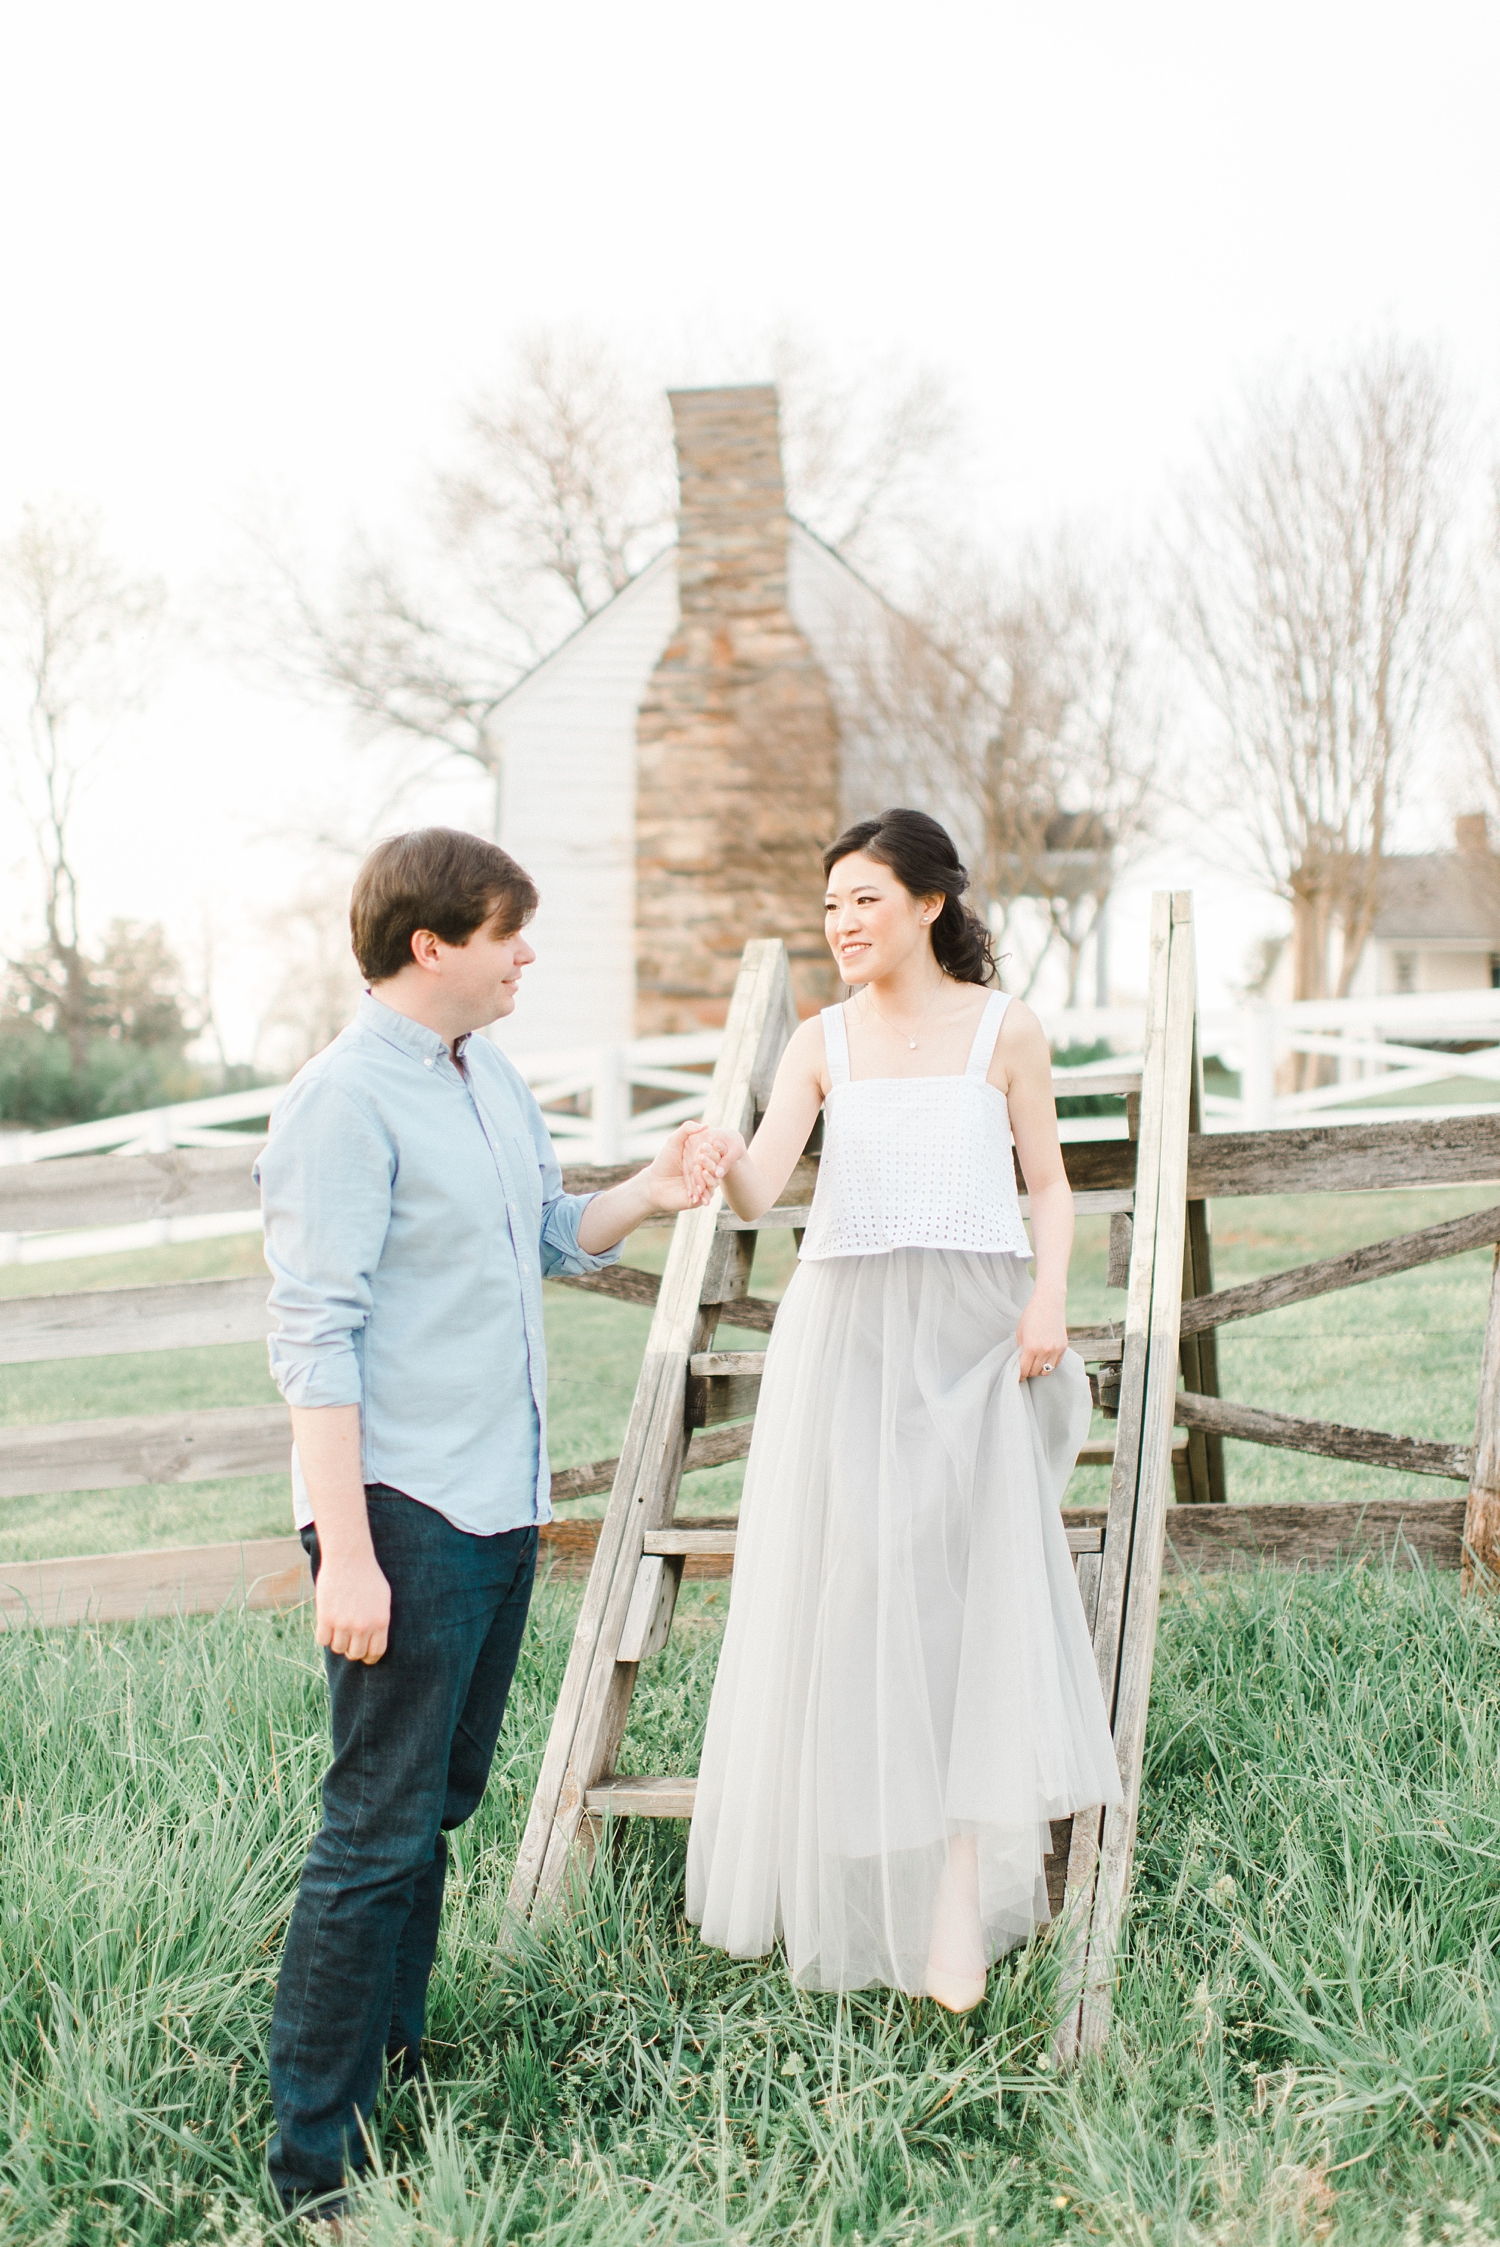 ash_lawn_charlottesville_couples_portraits_0010.jpg